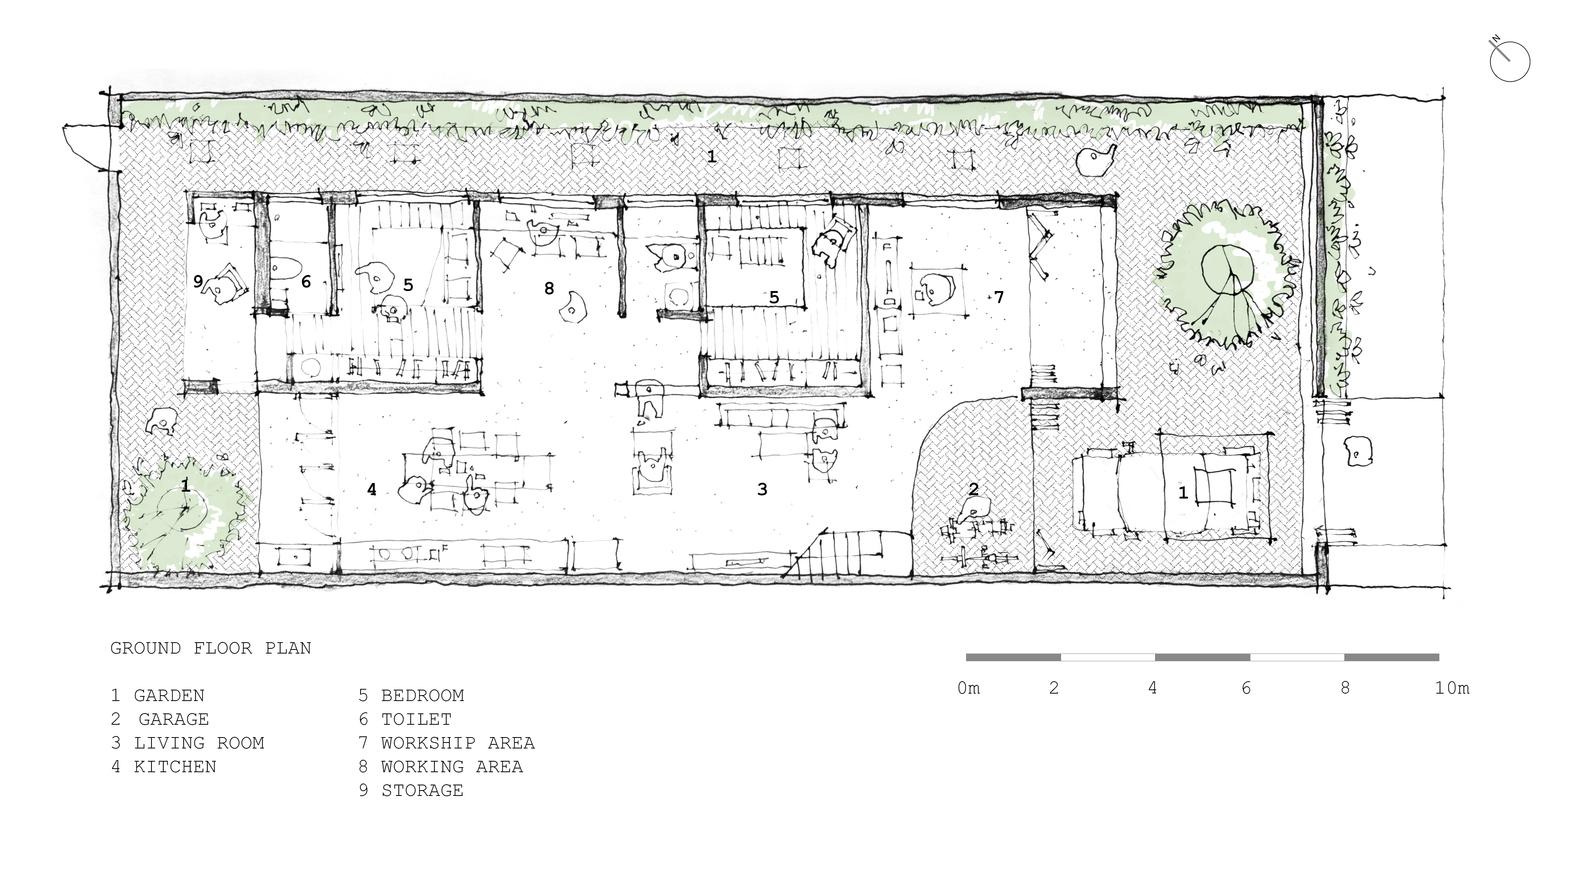 medium resolution of tile roof house k59atelier ground floor plan